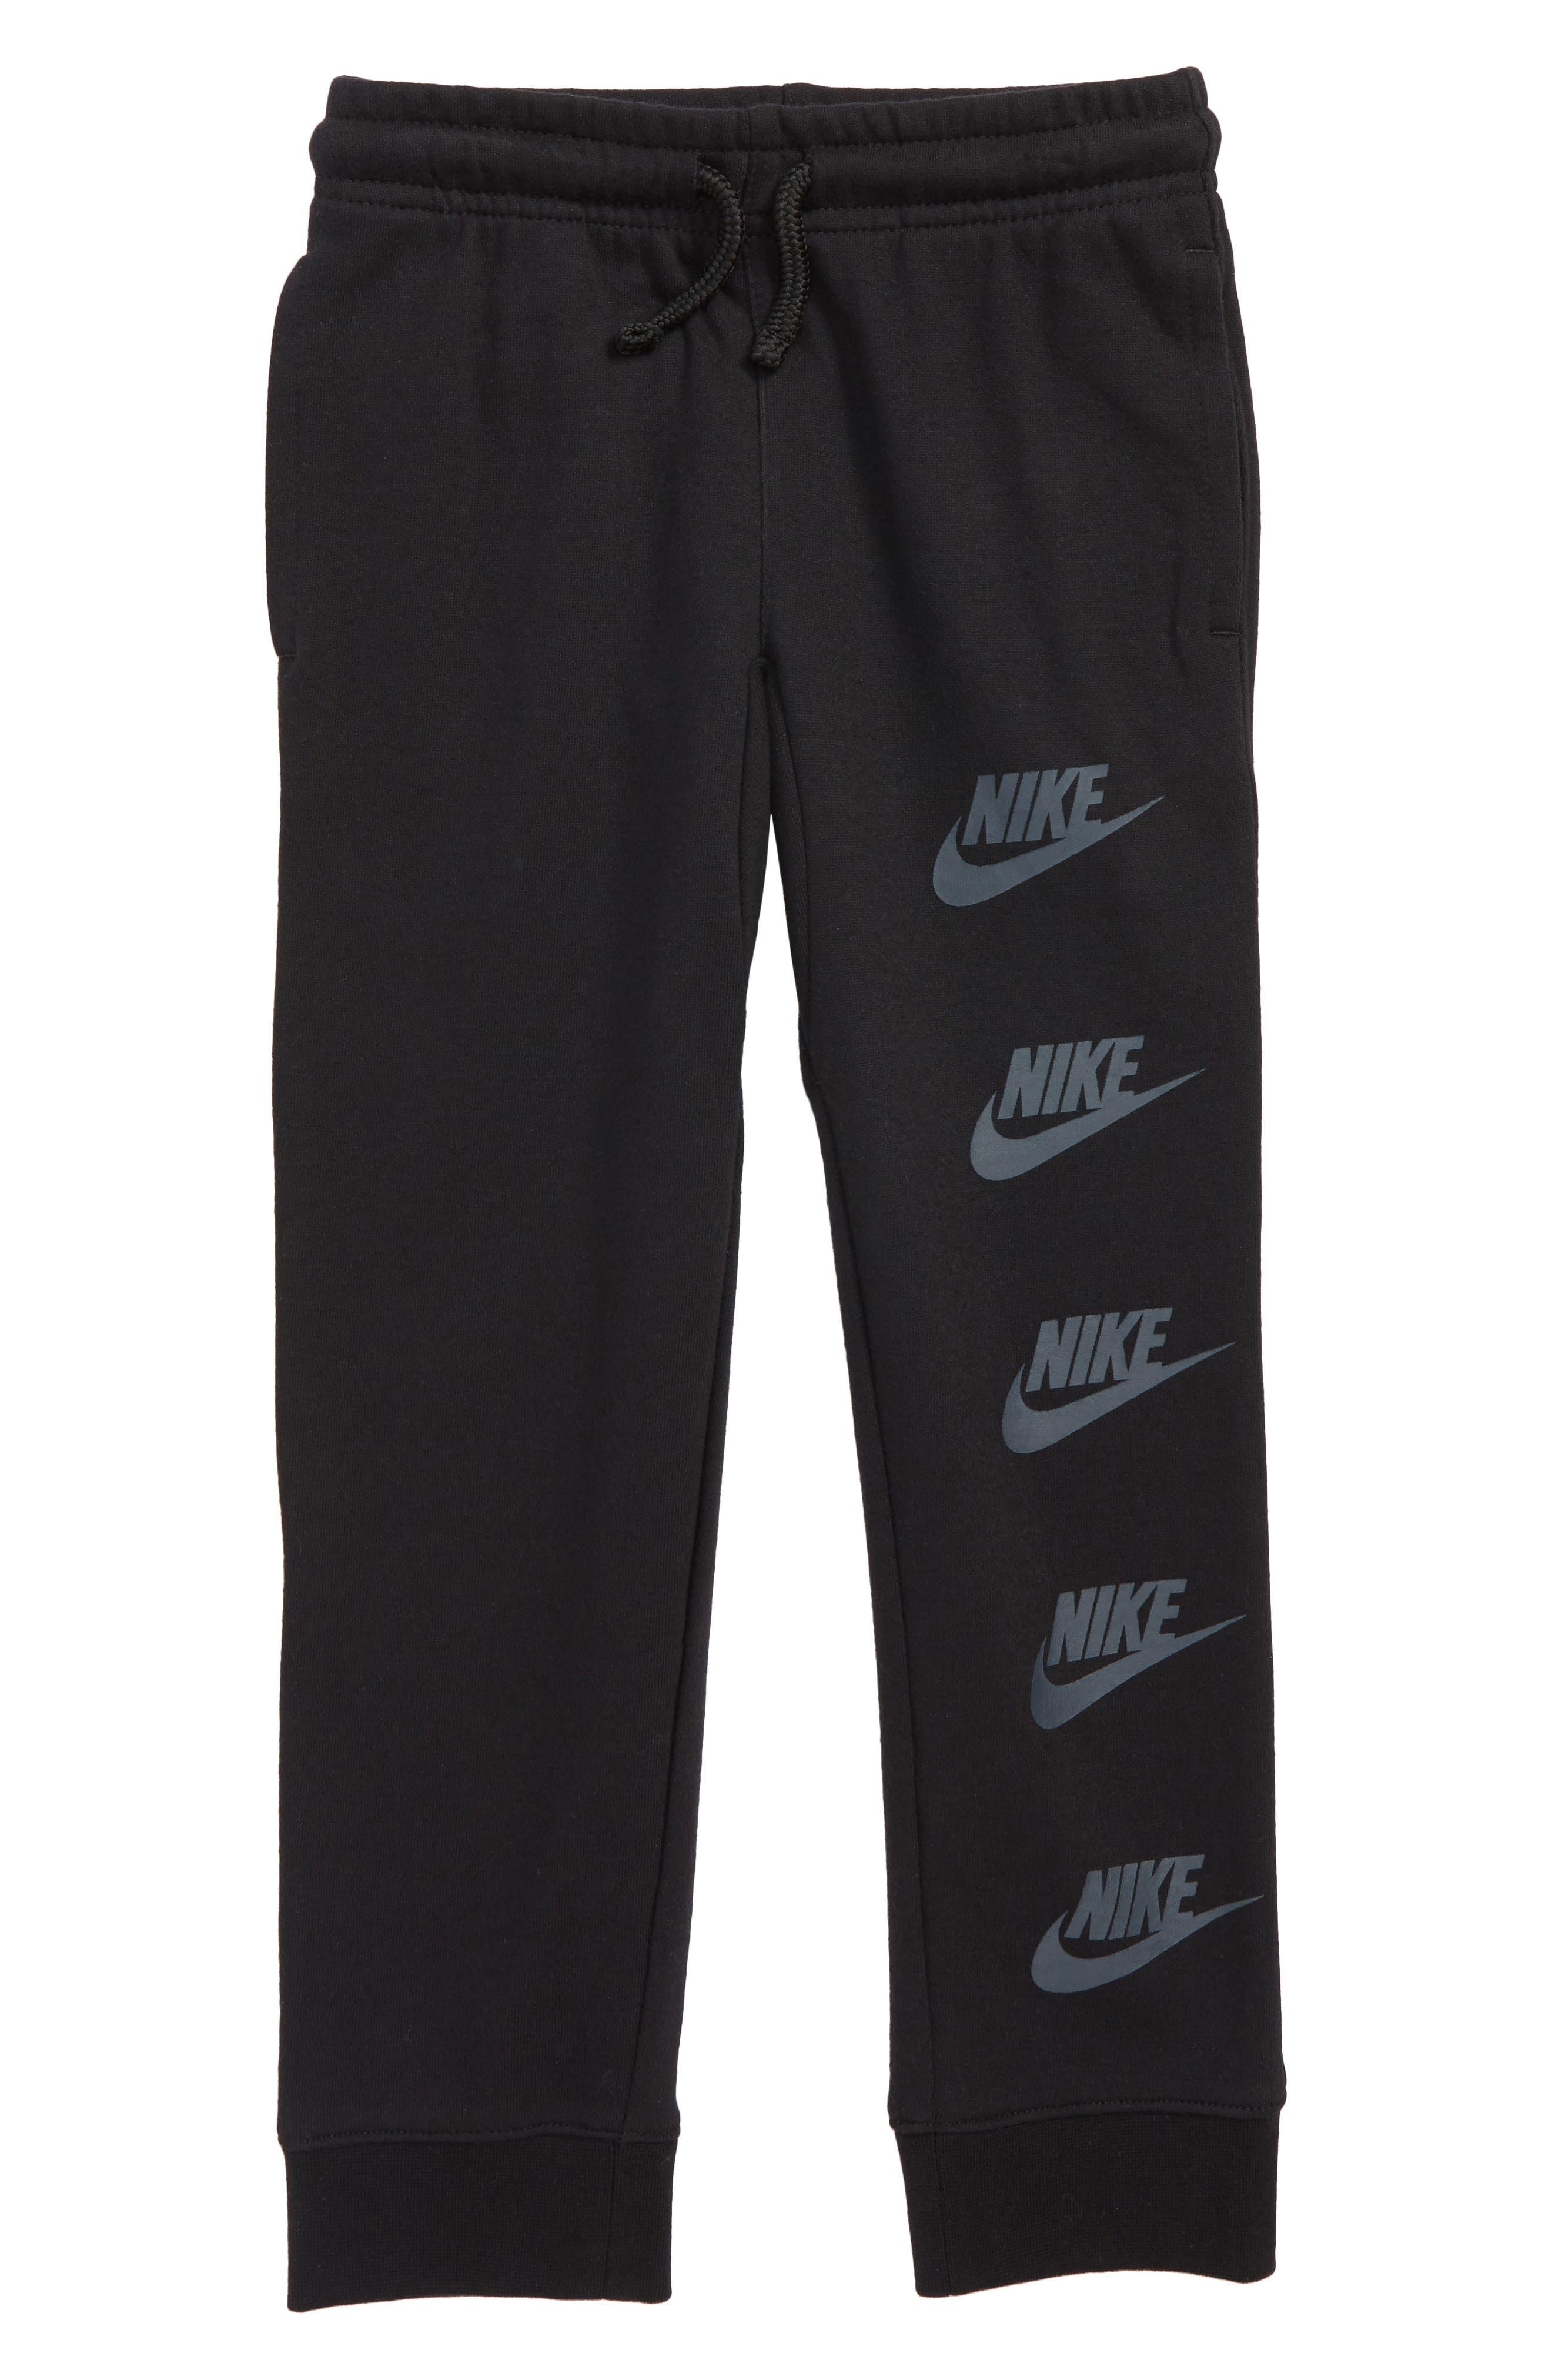 Sportswear Club Archive Fleece Sweatpants,                         Main,                         color, BLACK